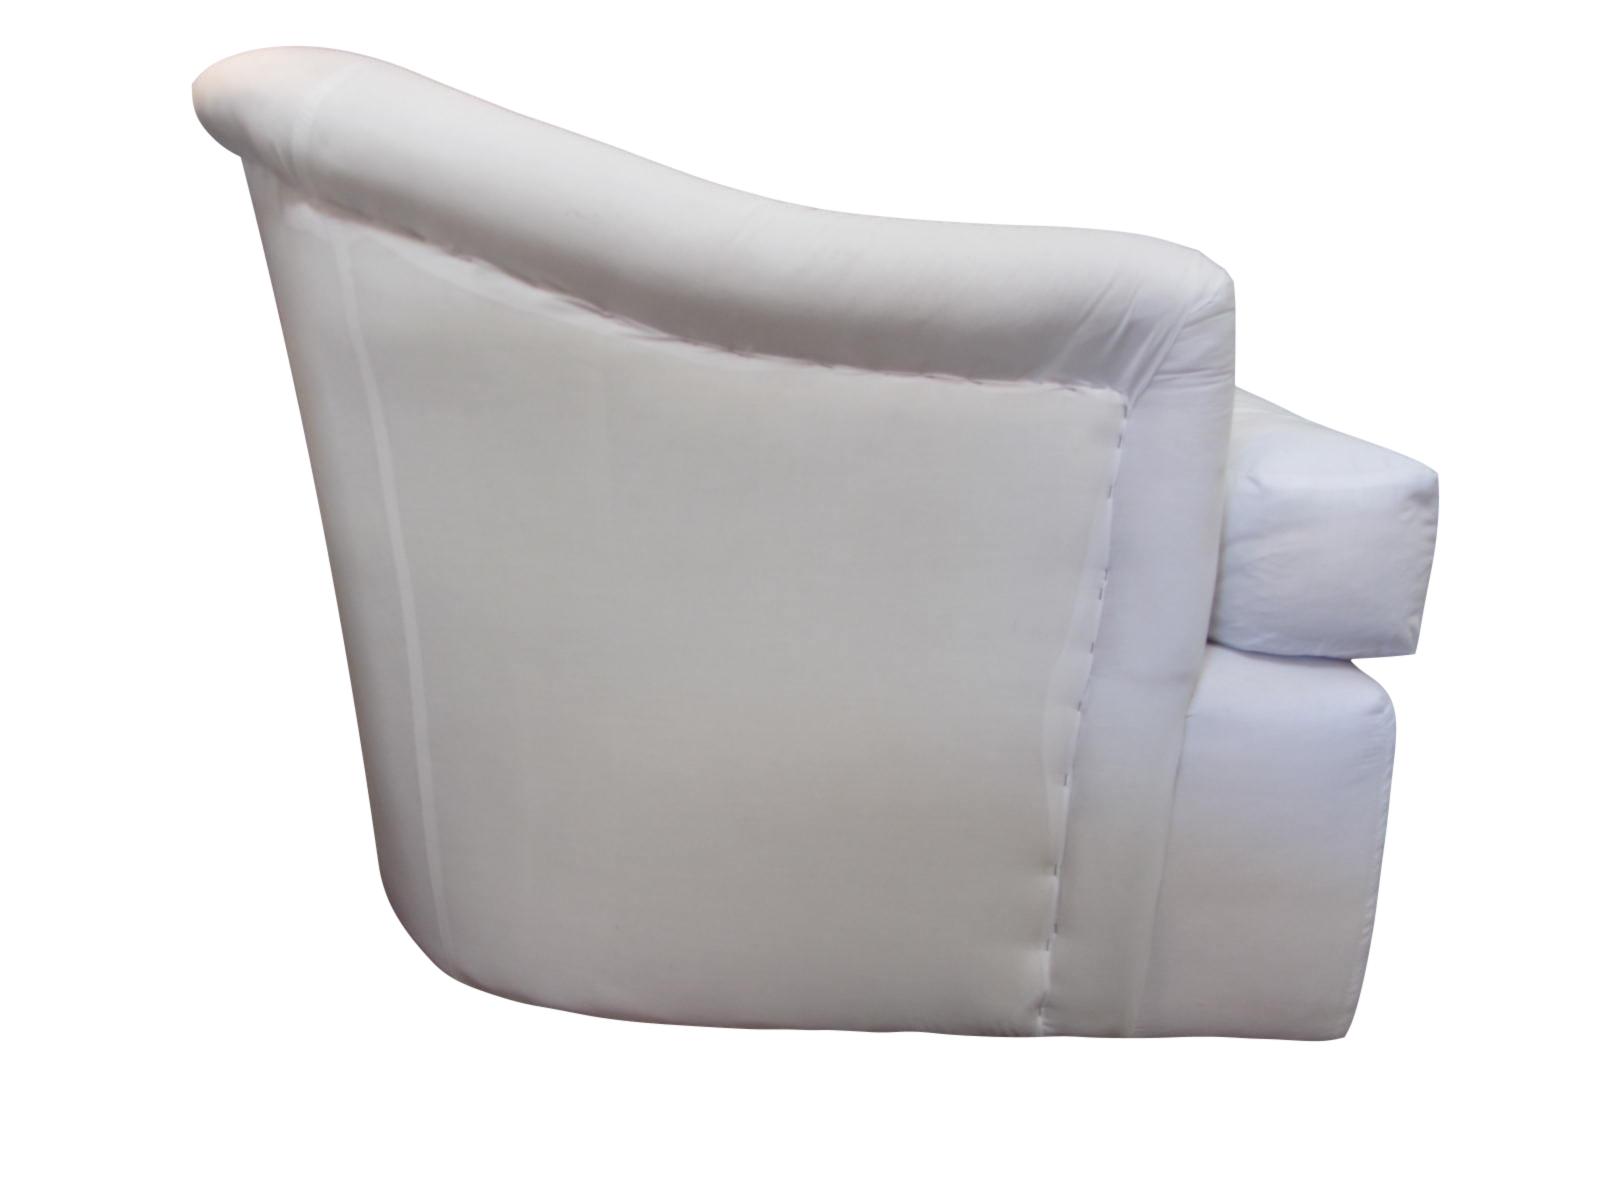 Contemporary A. Rudin Swivel Chairs u0026 Ottoman For Sale - Image 3 ...  sc 1 st  Chairish & A. Rudin Swivel Chairs u0026 Ottoman   Chairish